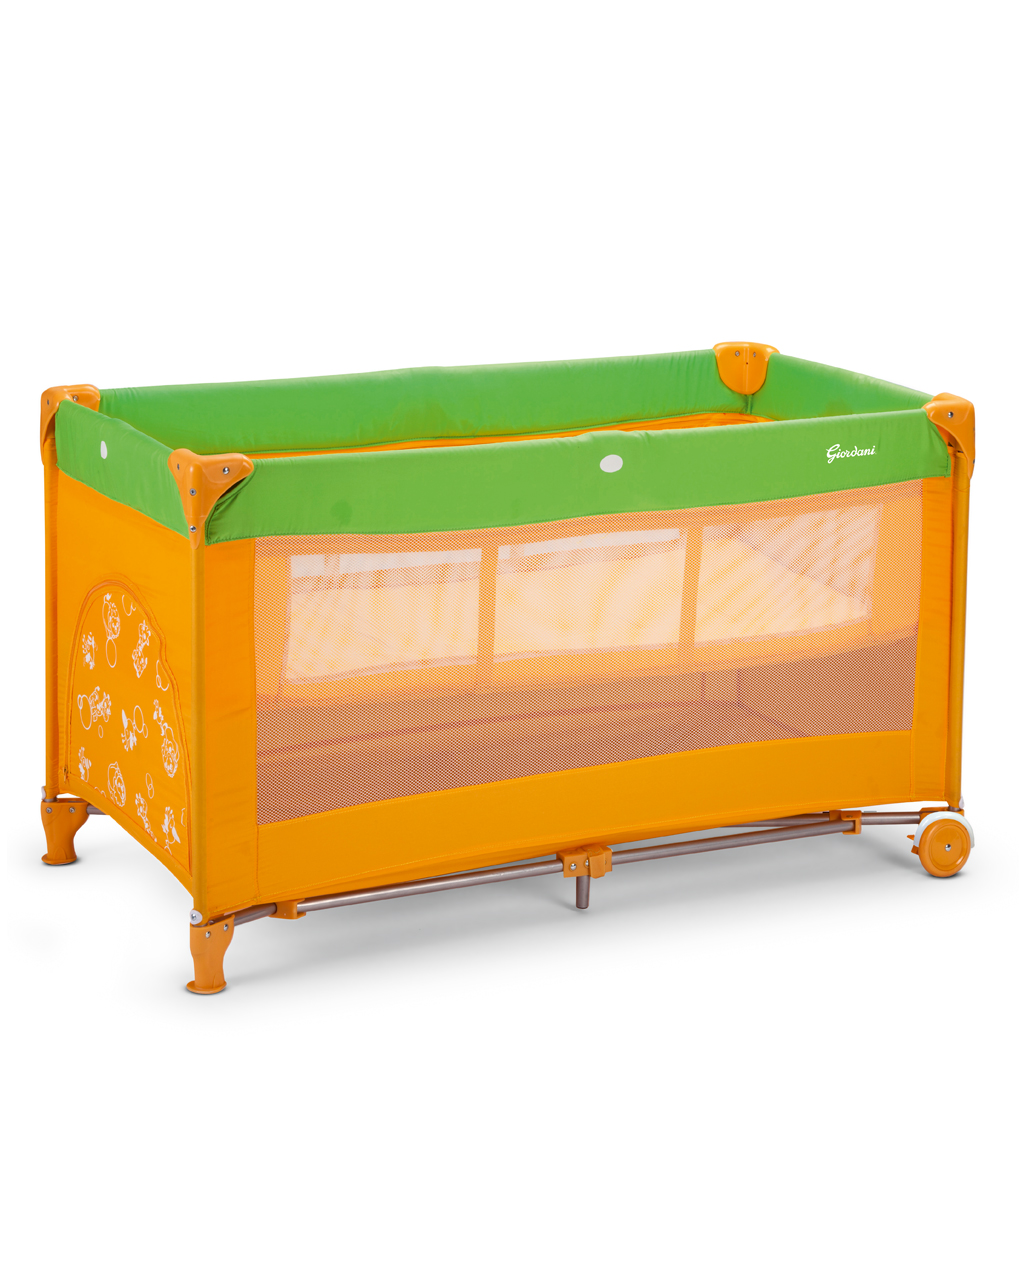 Lettino double orange/green - Giordani